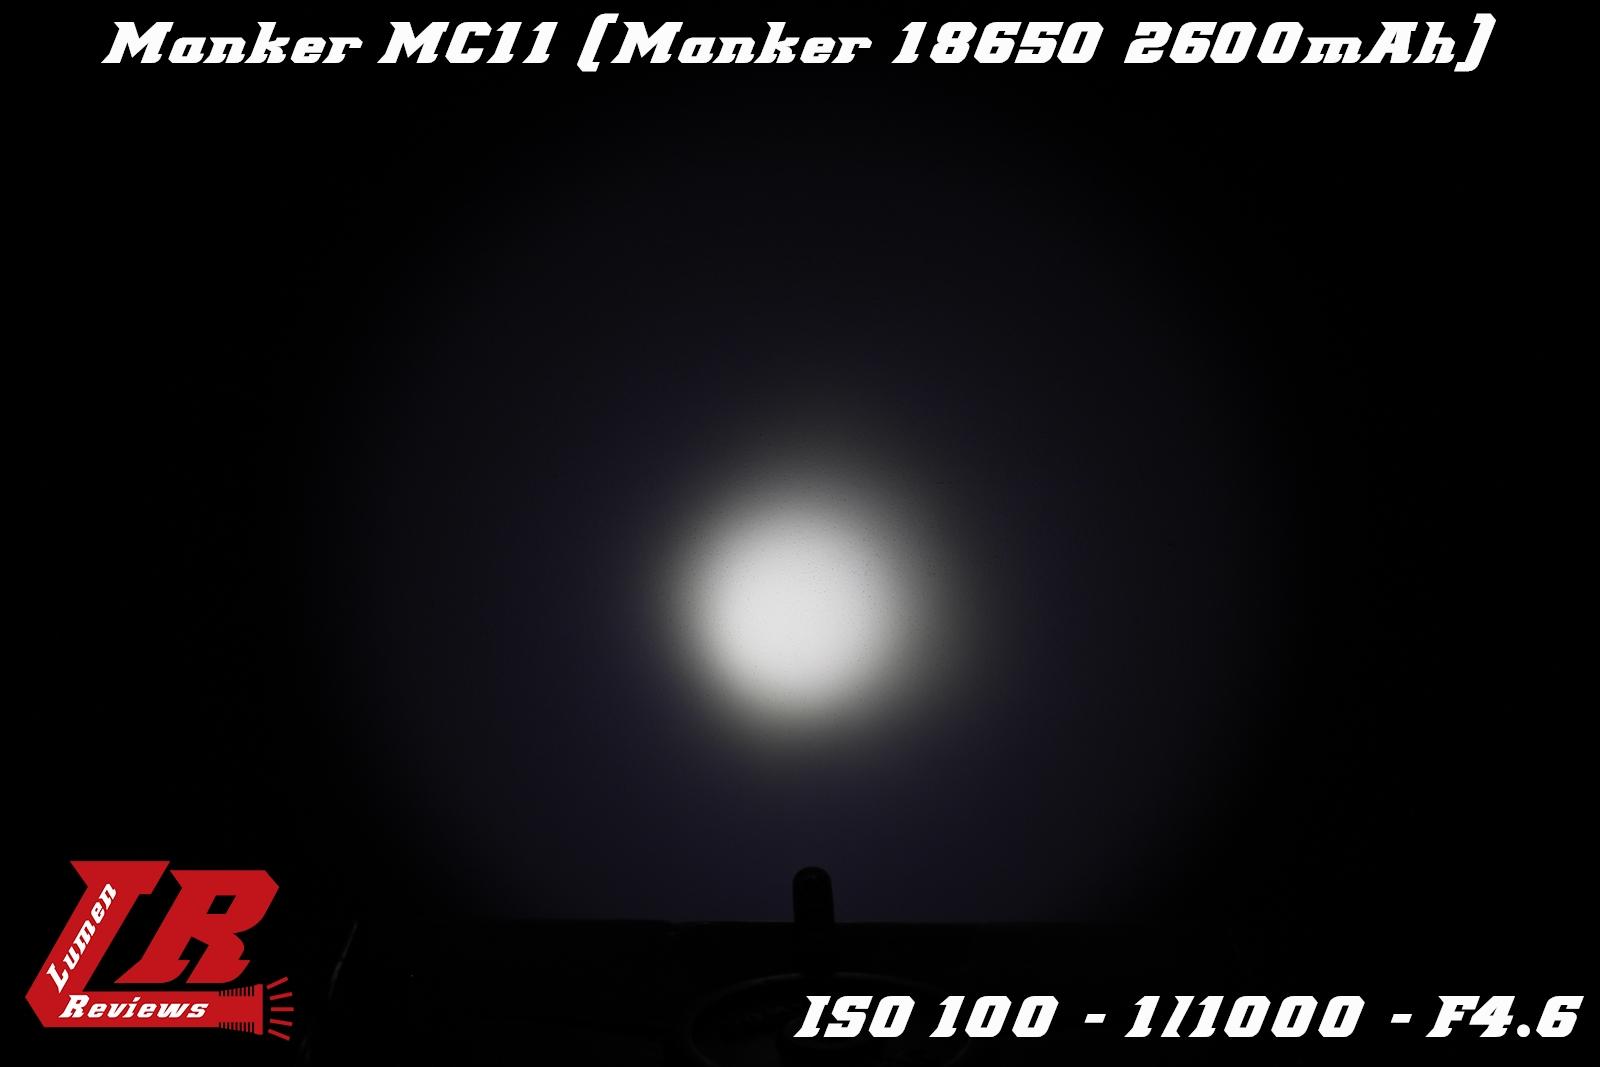 Manker MC11 BS 7